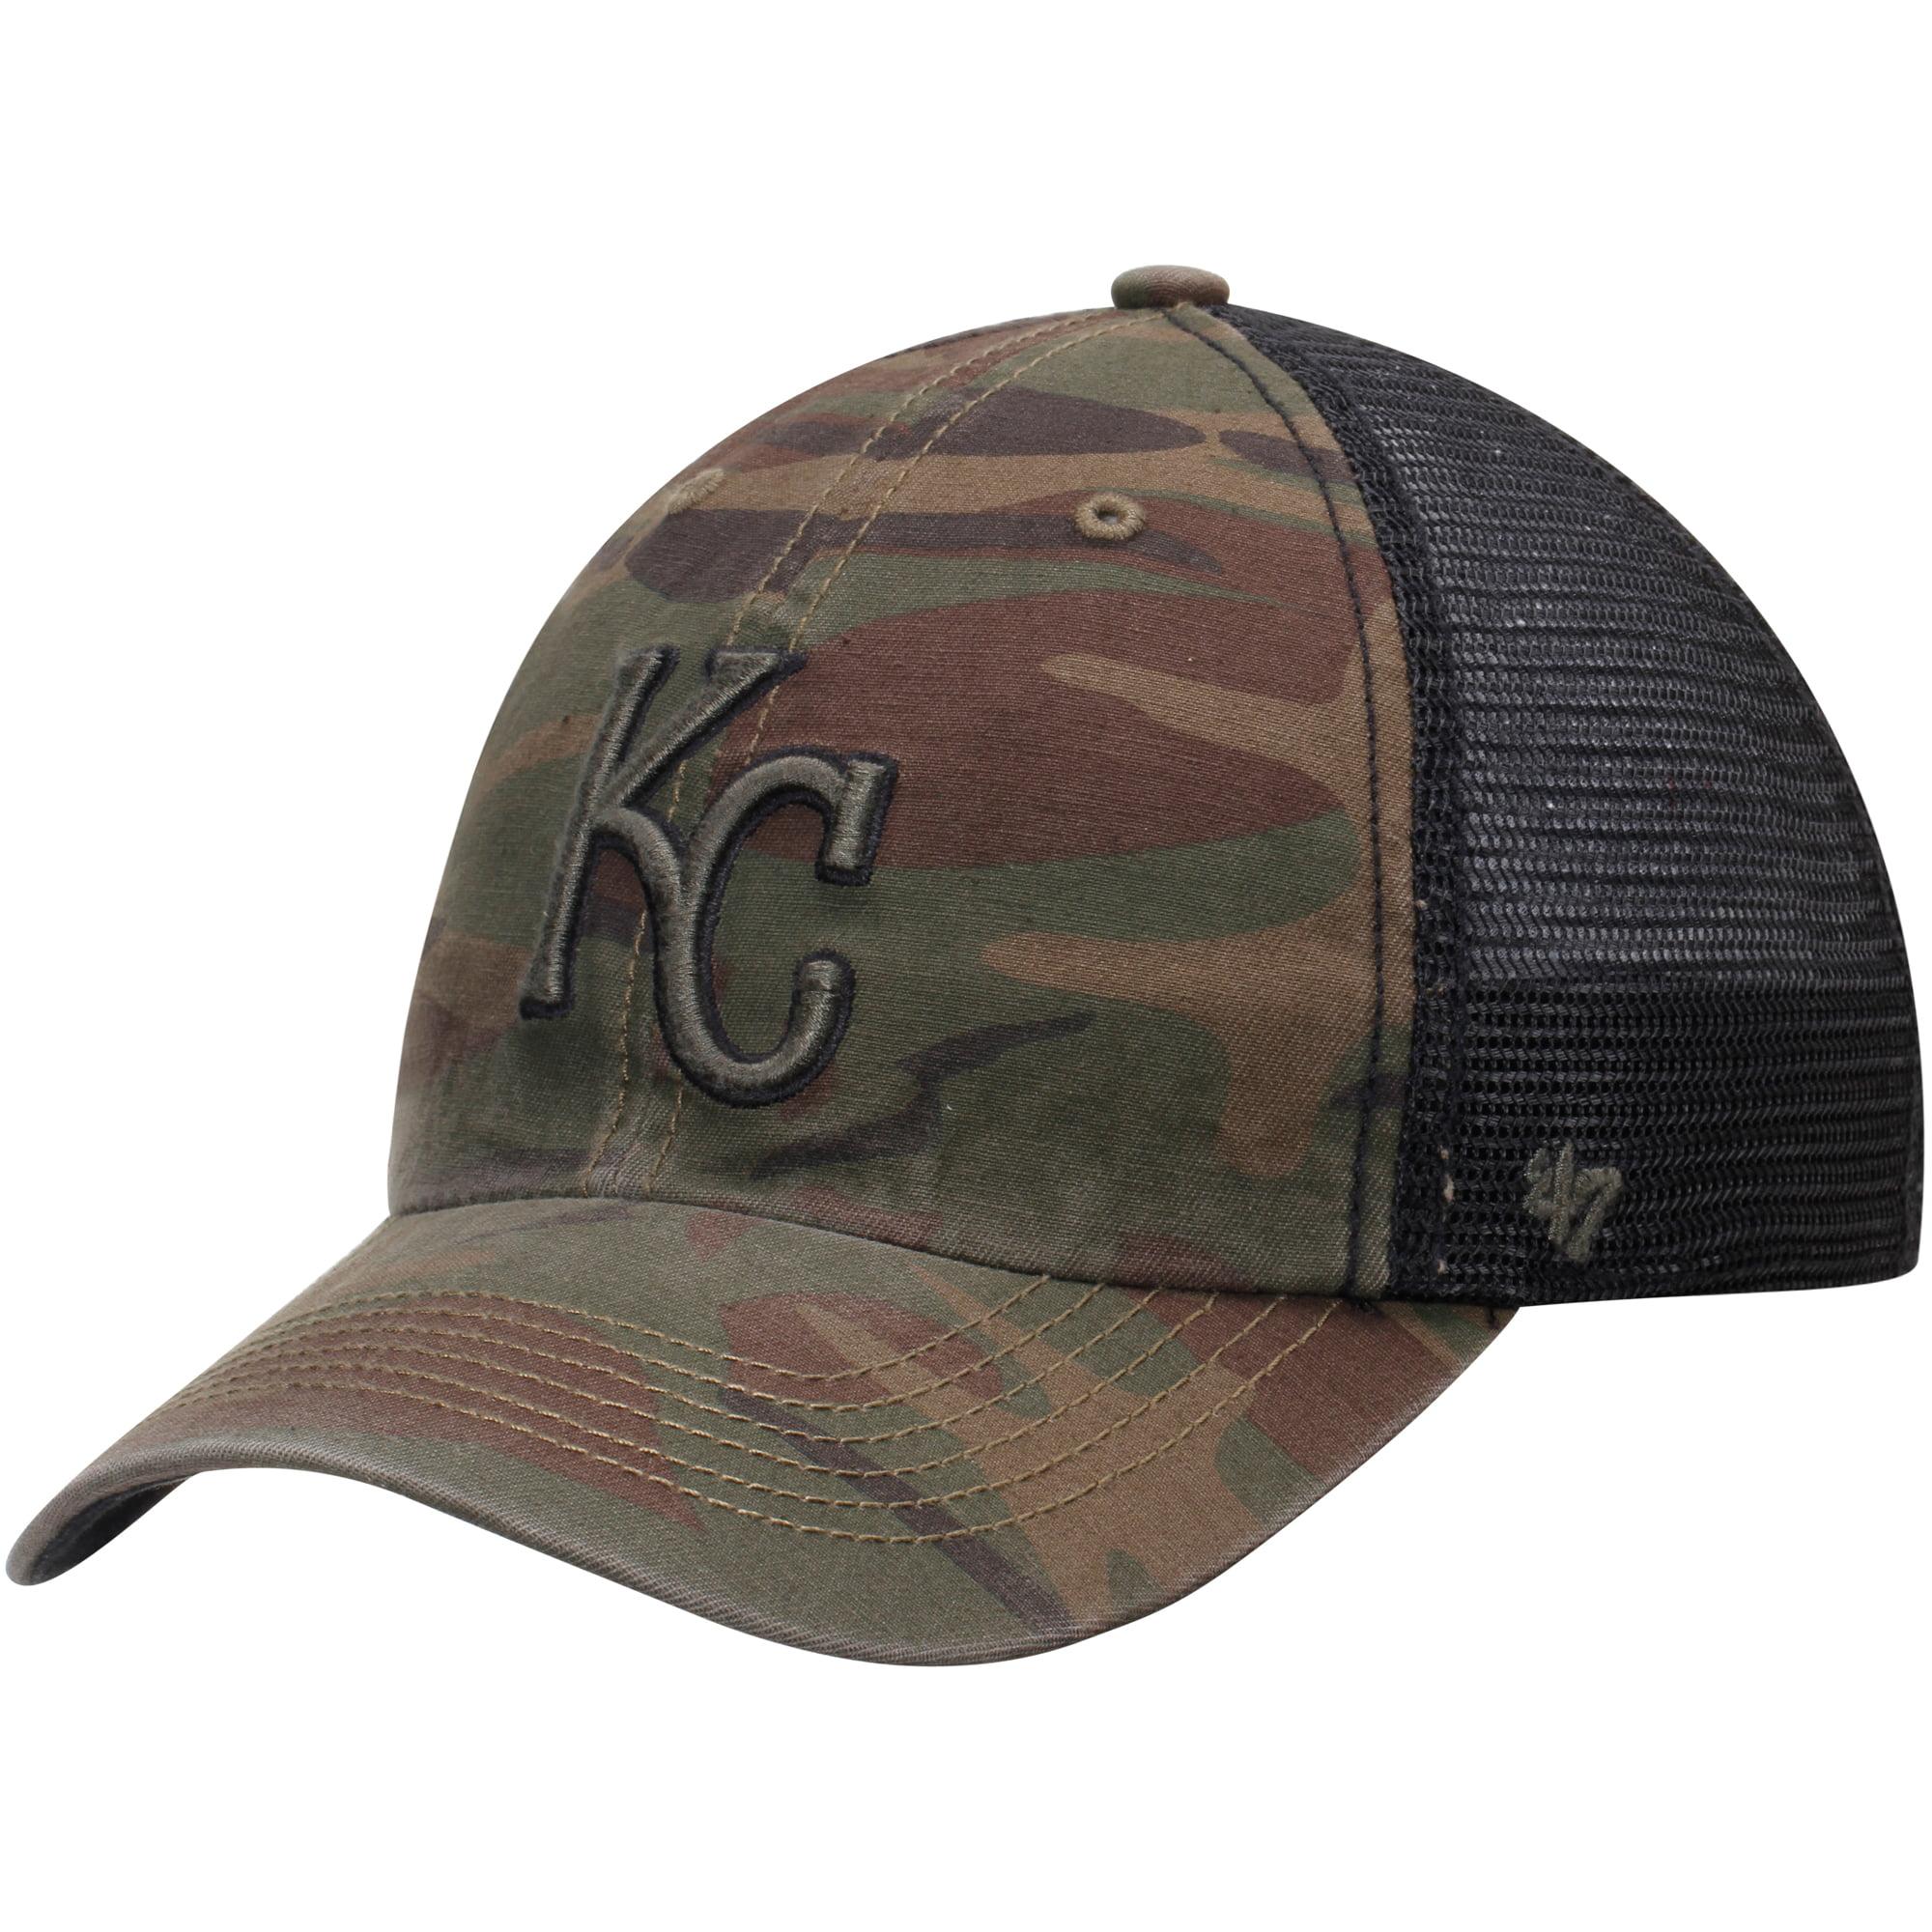 Kansas City Royals '47 Beaufort Closer Flex Hat - Camo/Black - OSFA